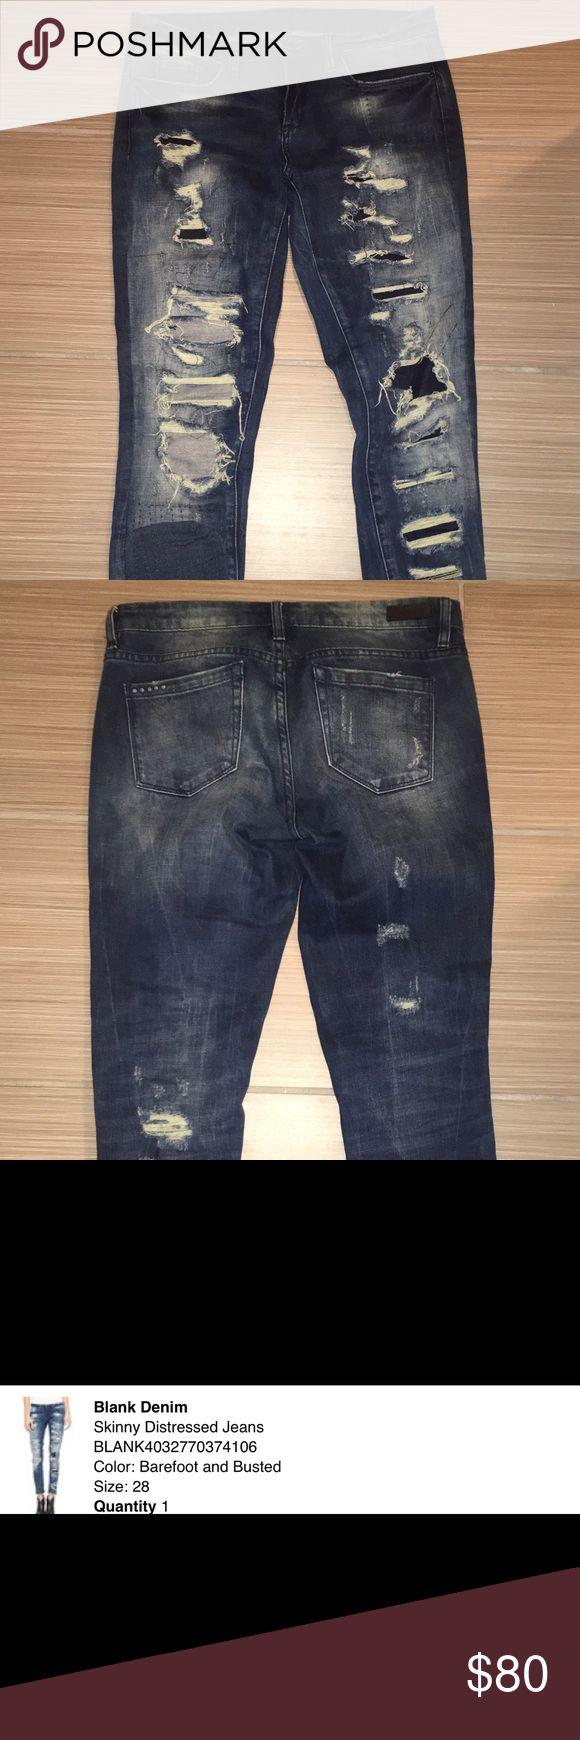 Blank denim skinny jeans size 28 Like new blank denim nyc skinny jeans. Worn twice! Blank Denim Jeans Skinny